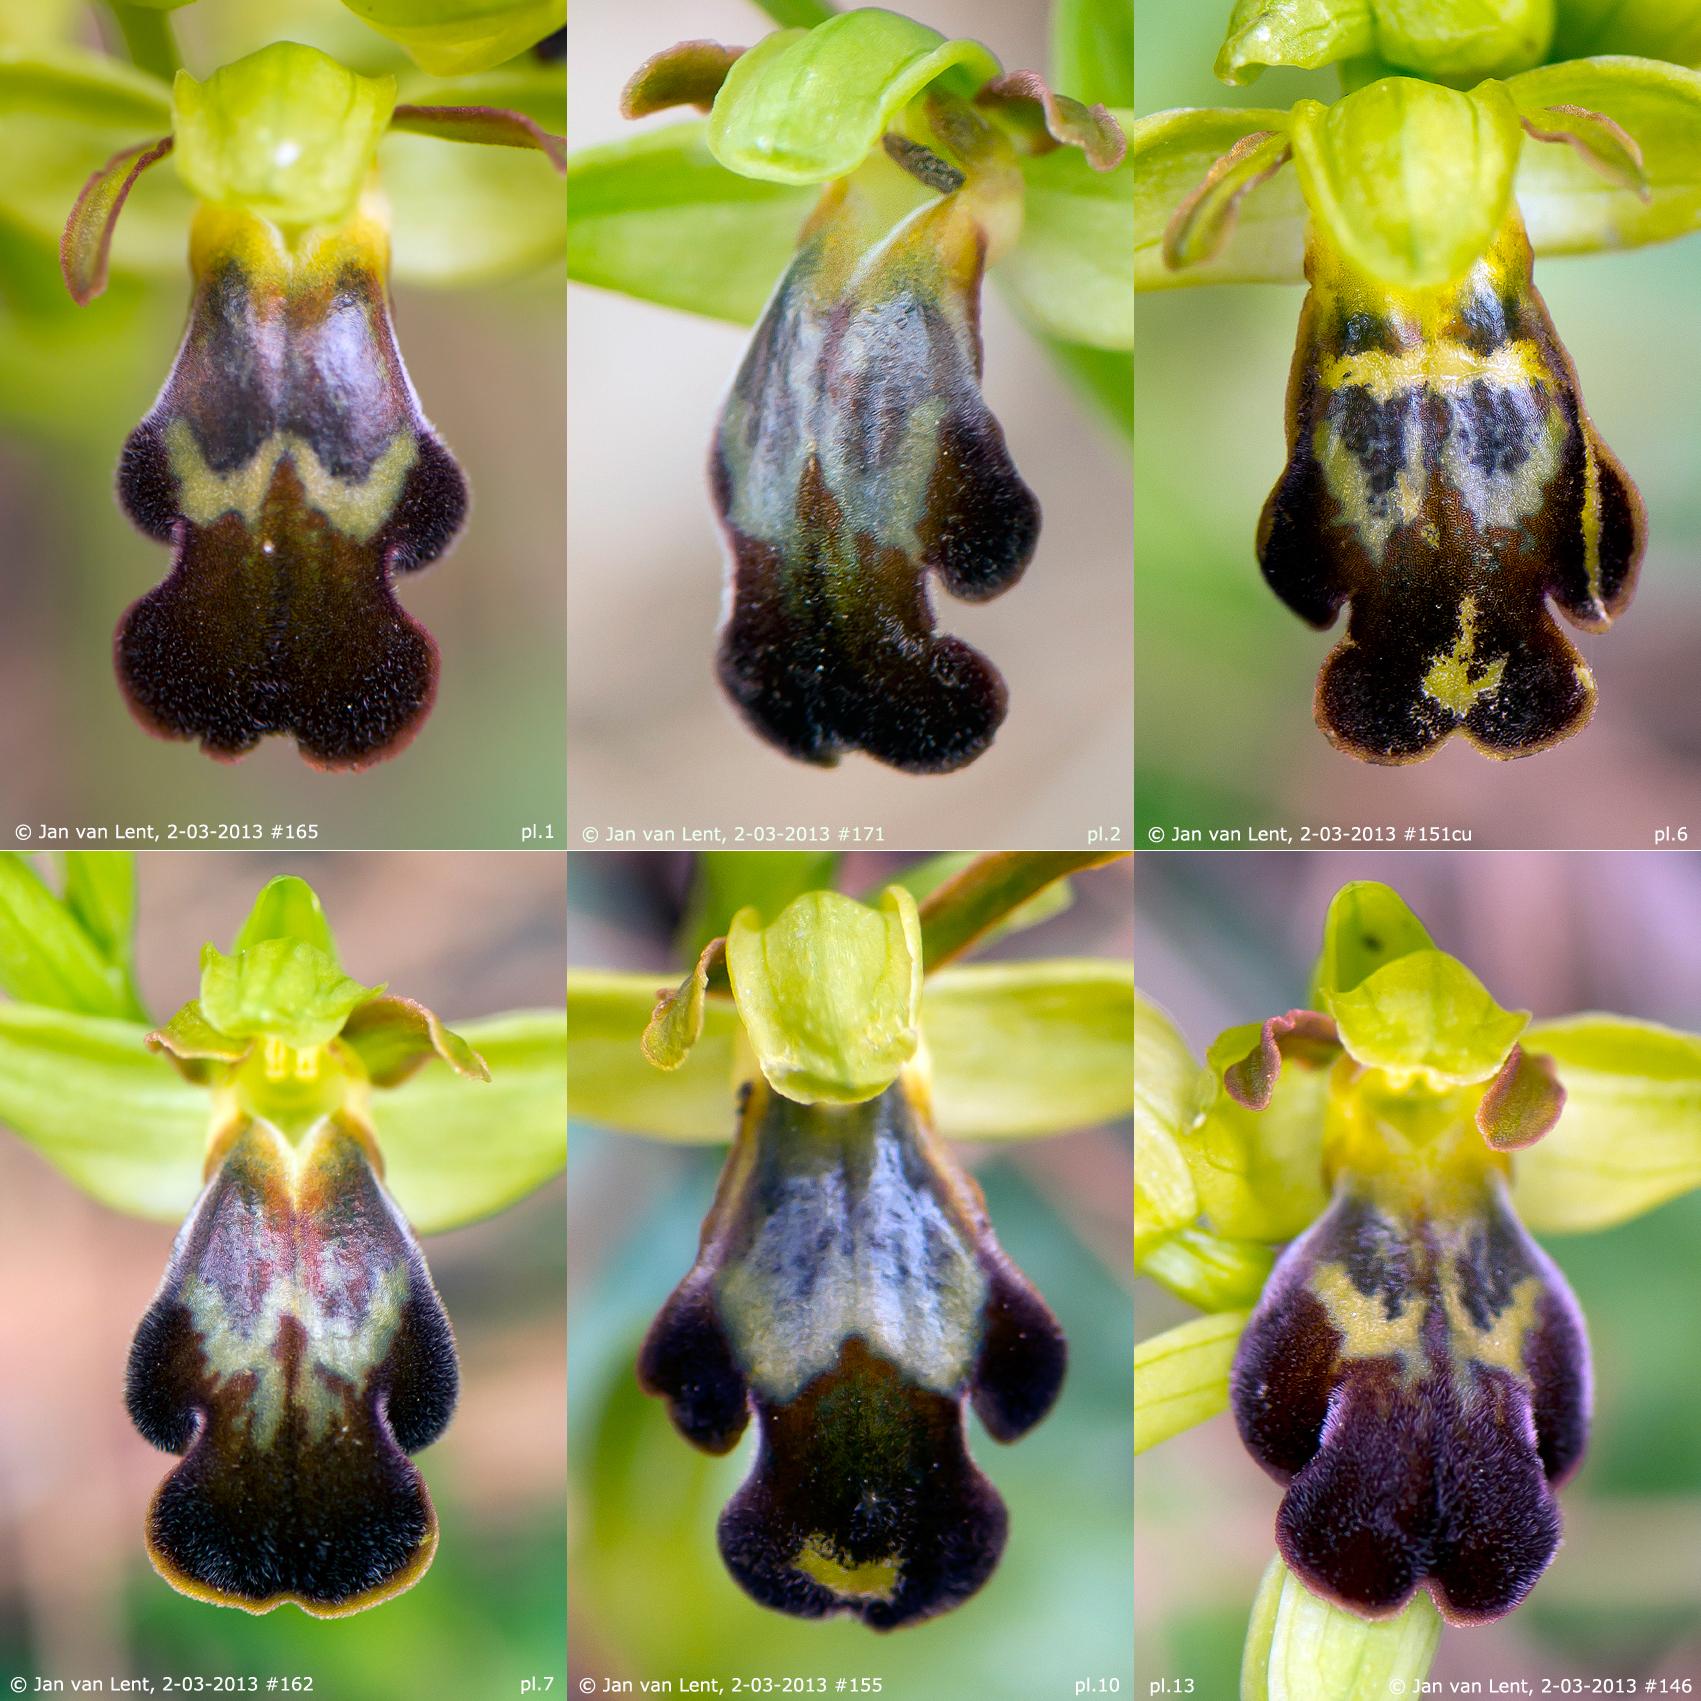 © Jan van Lent, 2-03-2013: 6 plants: pl.1 & 2: O. sancti-isidorii, pl6: O. phaseliana,  Pl.7: O.pelinaea, pl10: O.lindia, pl12: O.leucadica.